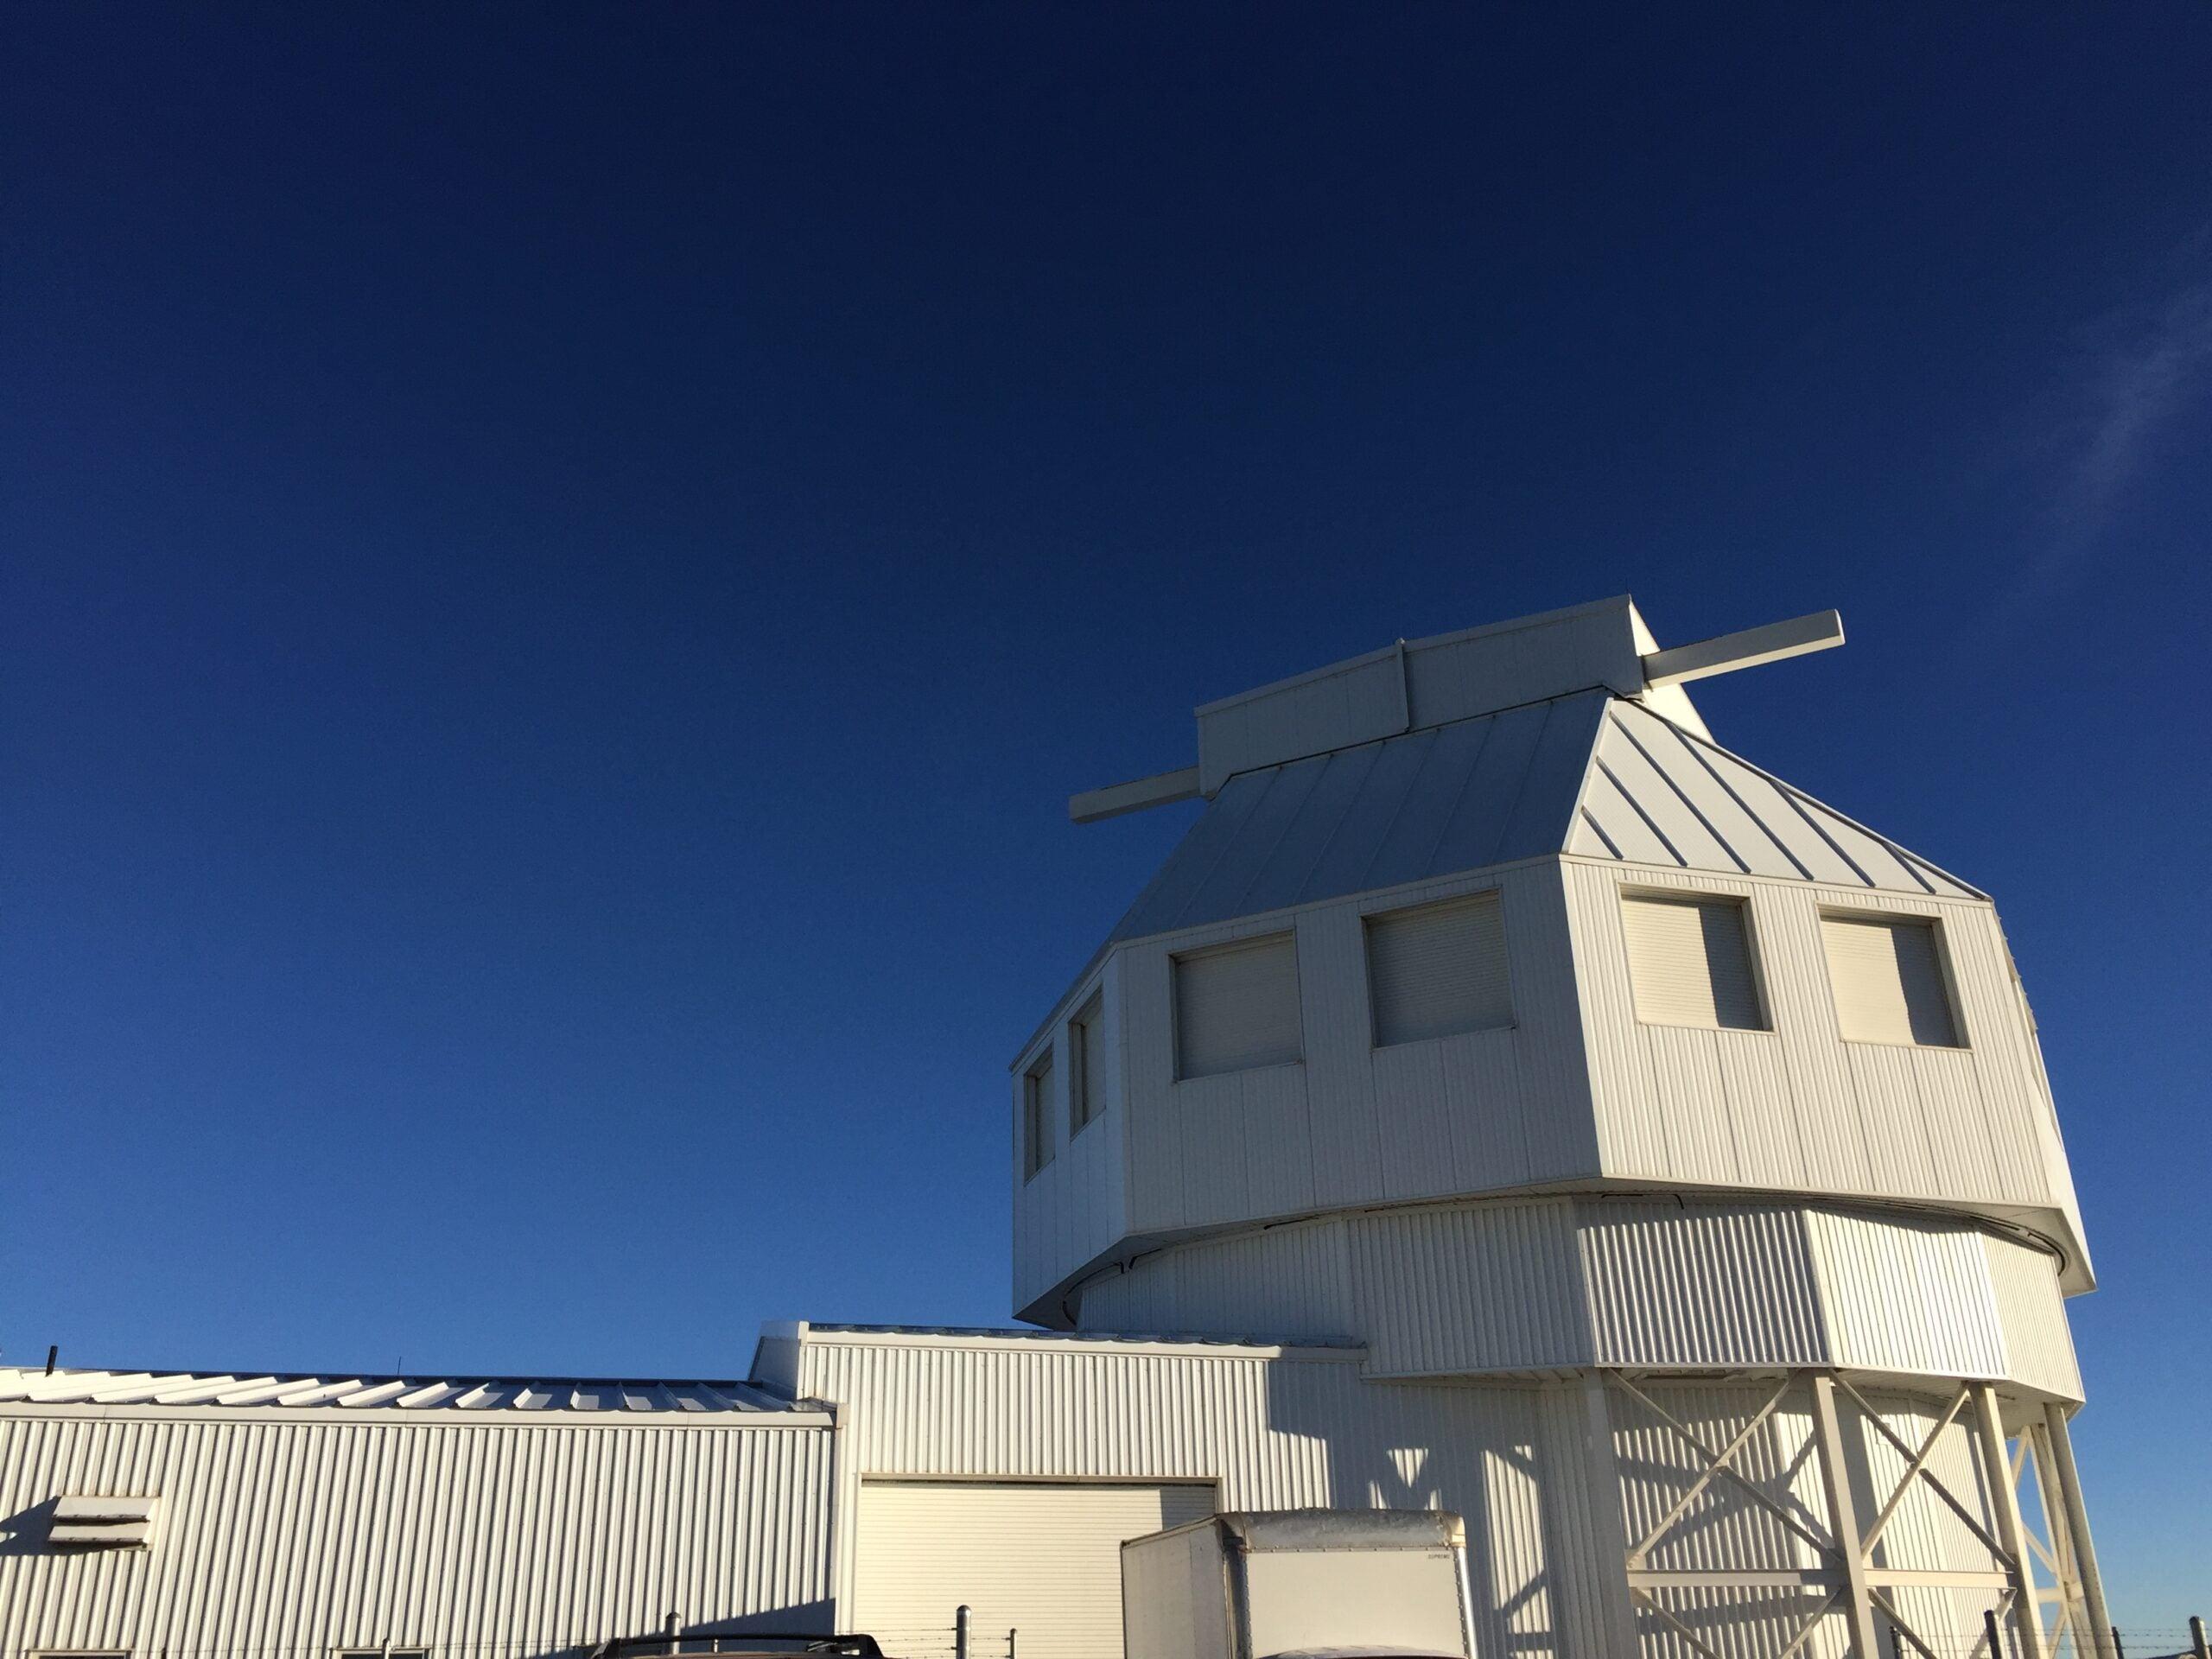 The Space Surveillance Telescope Complex